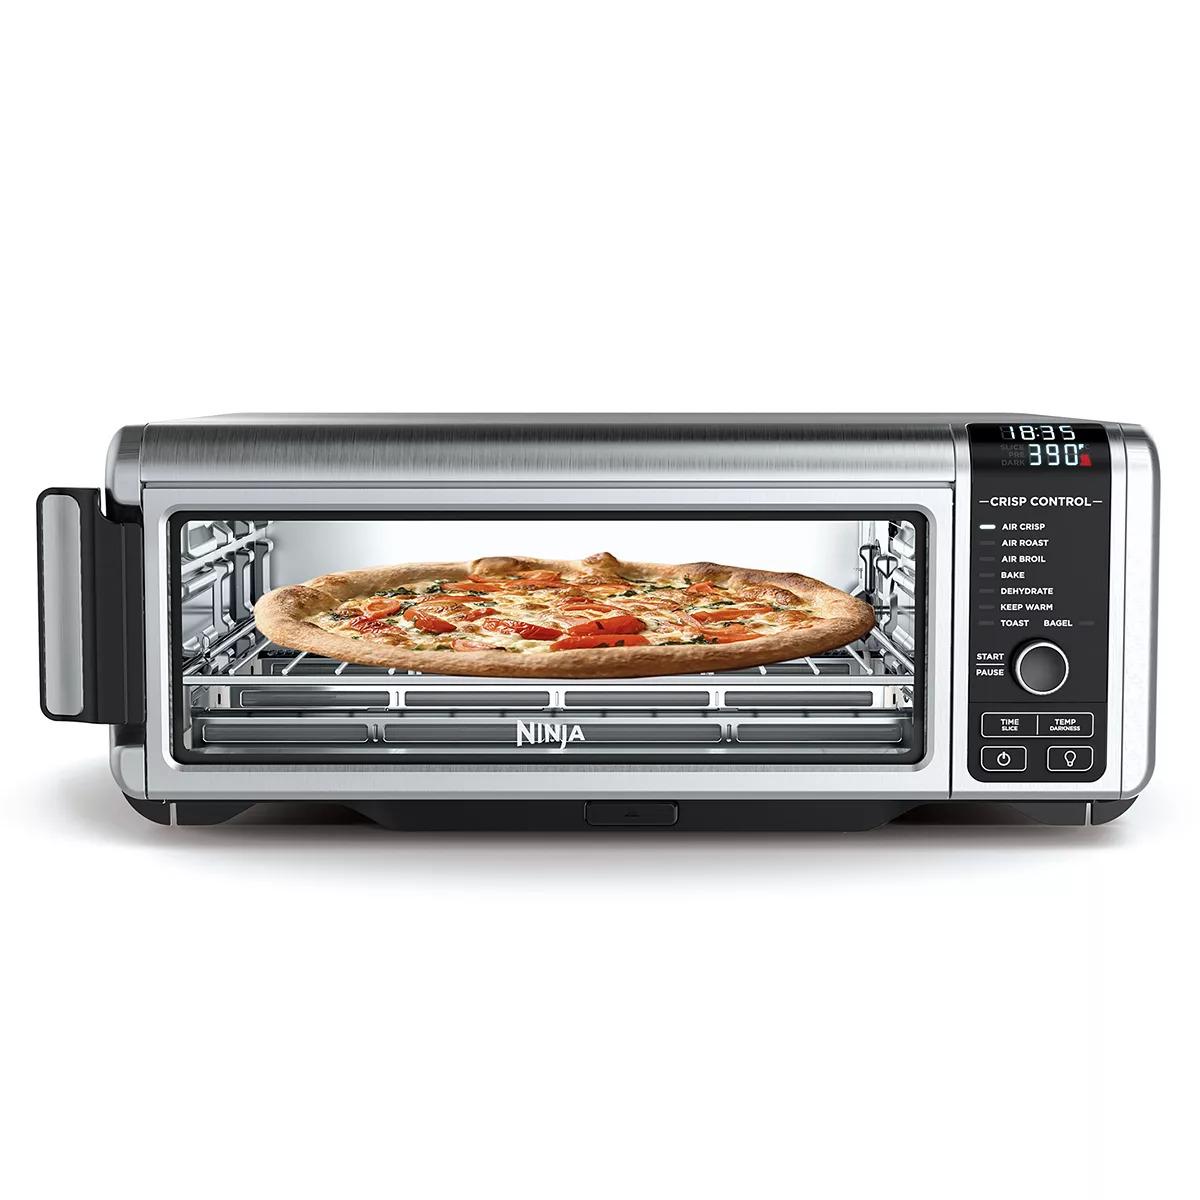 Ninja Foodi Digital Air Fryer Oven SP101